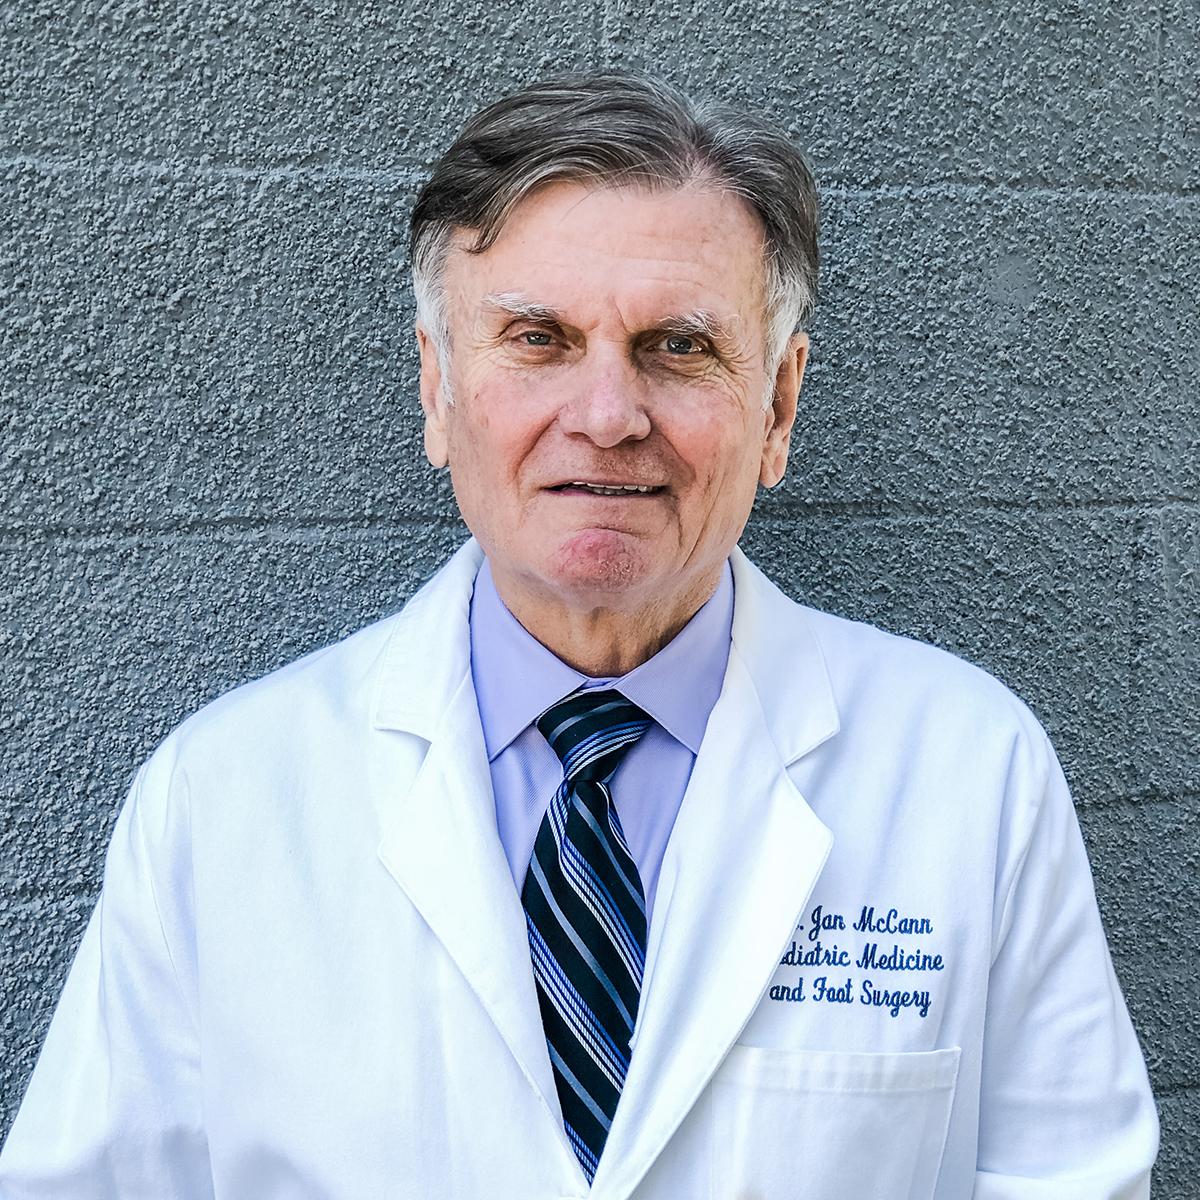 Jan McCann, DPM - Podiatrist in Laguna Hills, CA